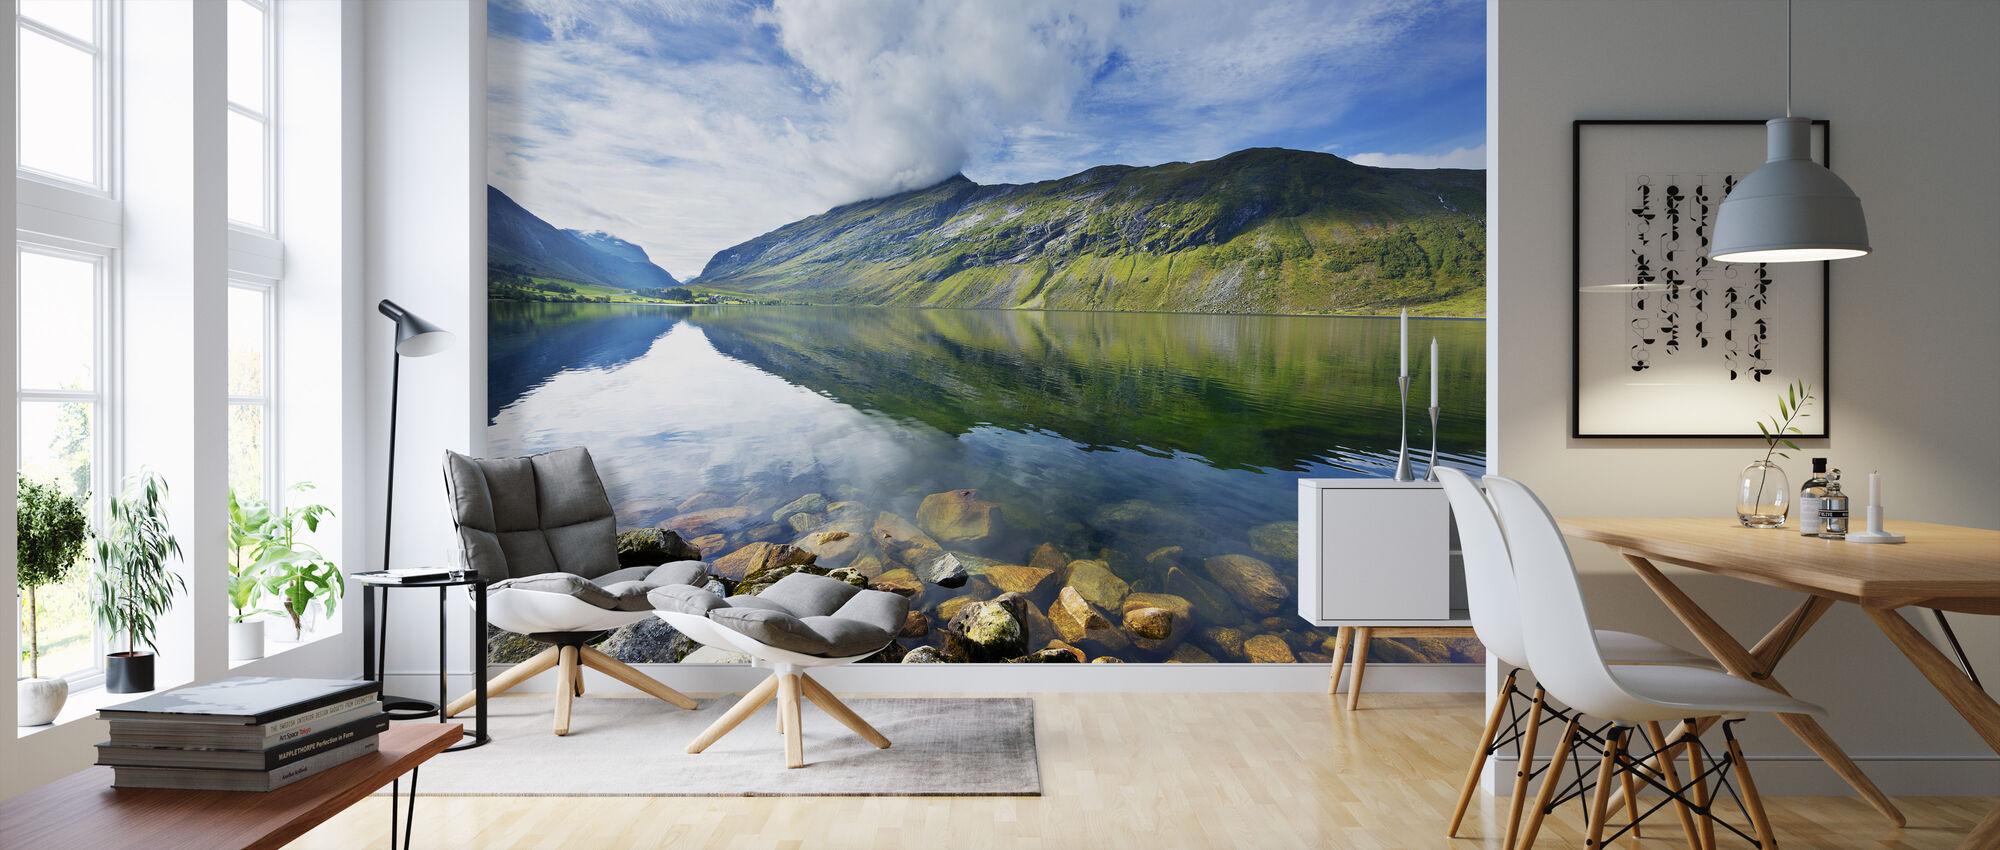 Eidsdal Lake in Geiranger, Noorwegen II - Behang - Woonkamer